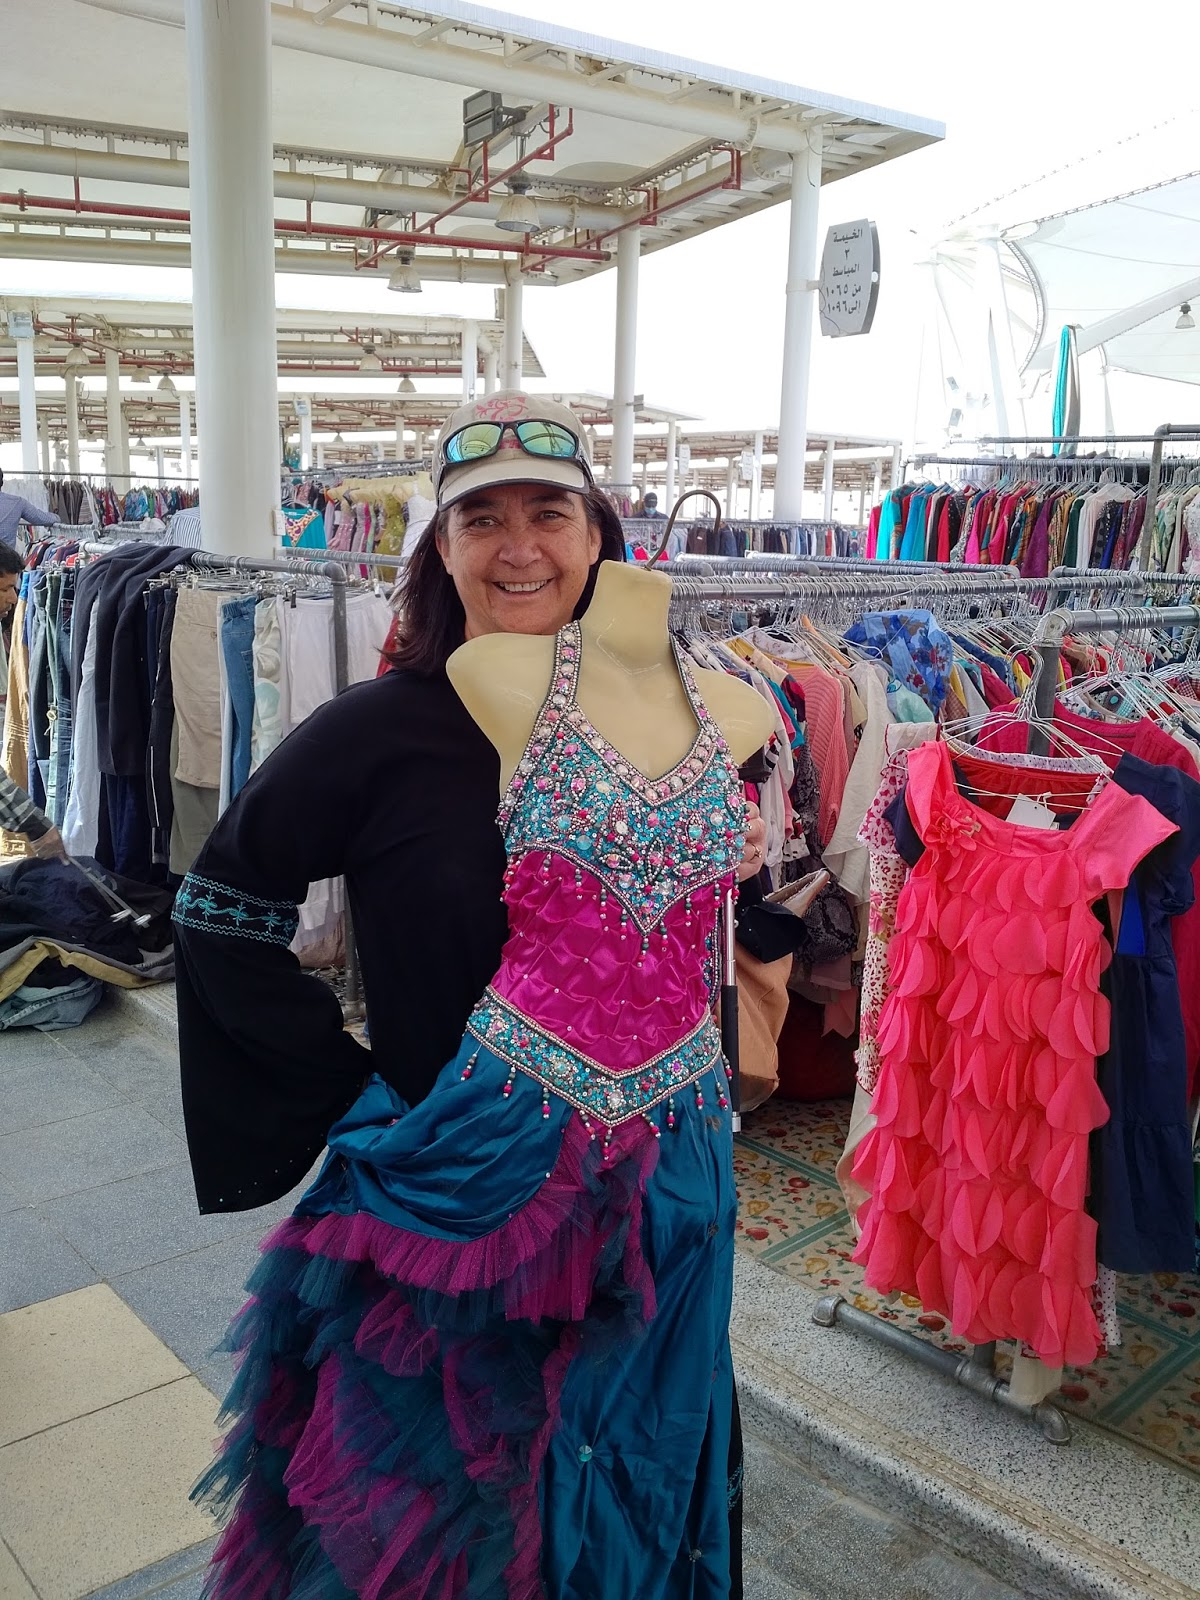 Visiting The New Princess Souq • Kiwi Living In Saudi